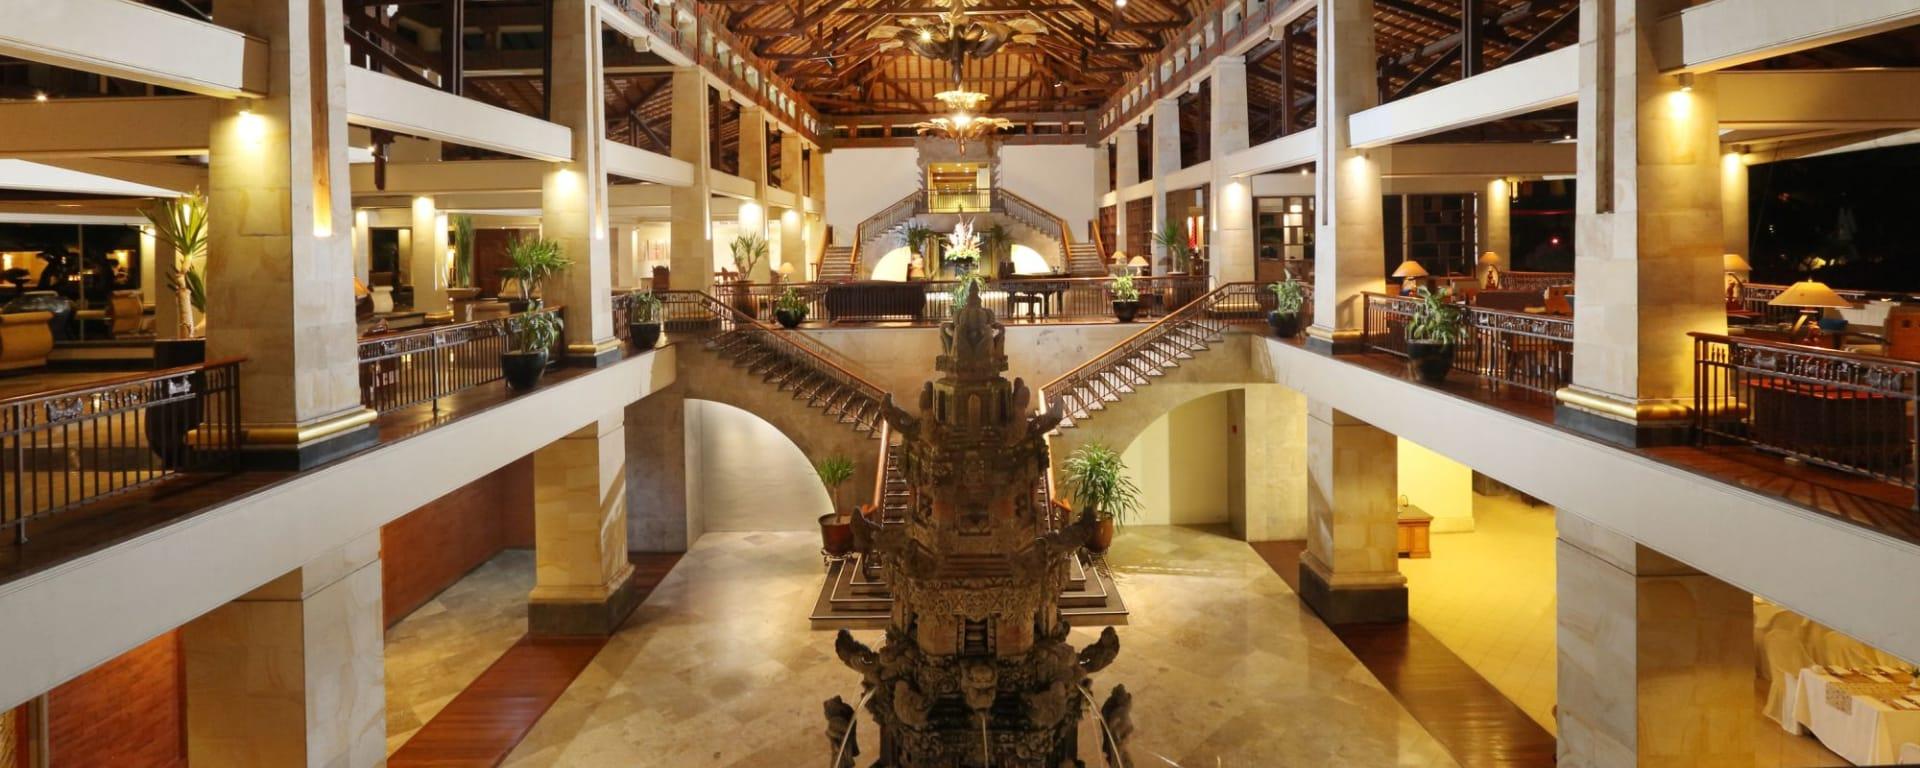 Nusa Dua Beach Hotel & Spa à Sud de Bali: Lobby